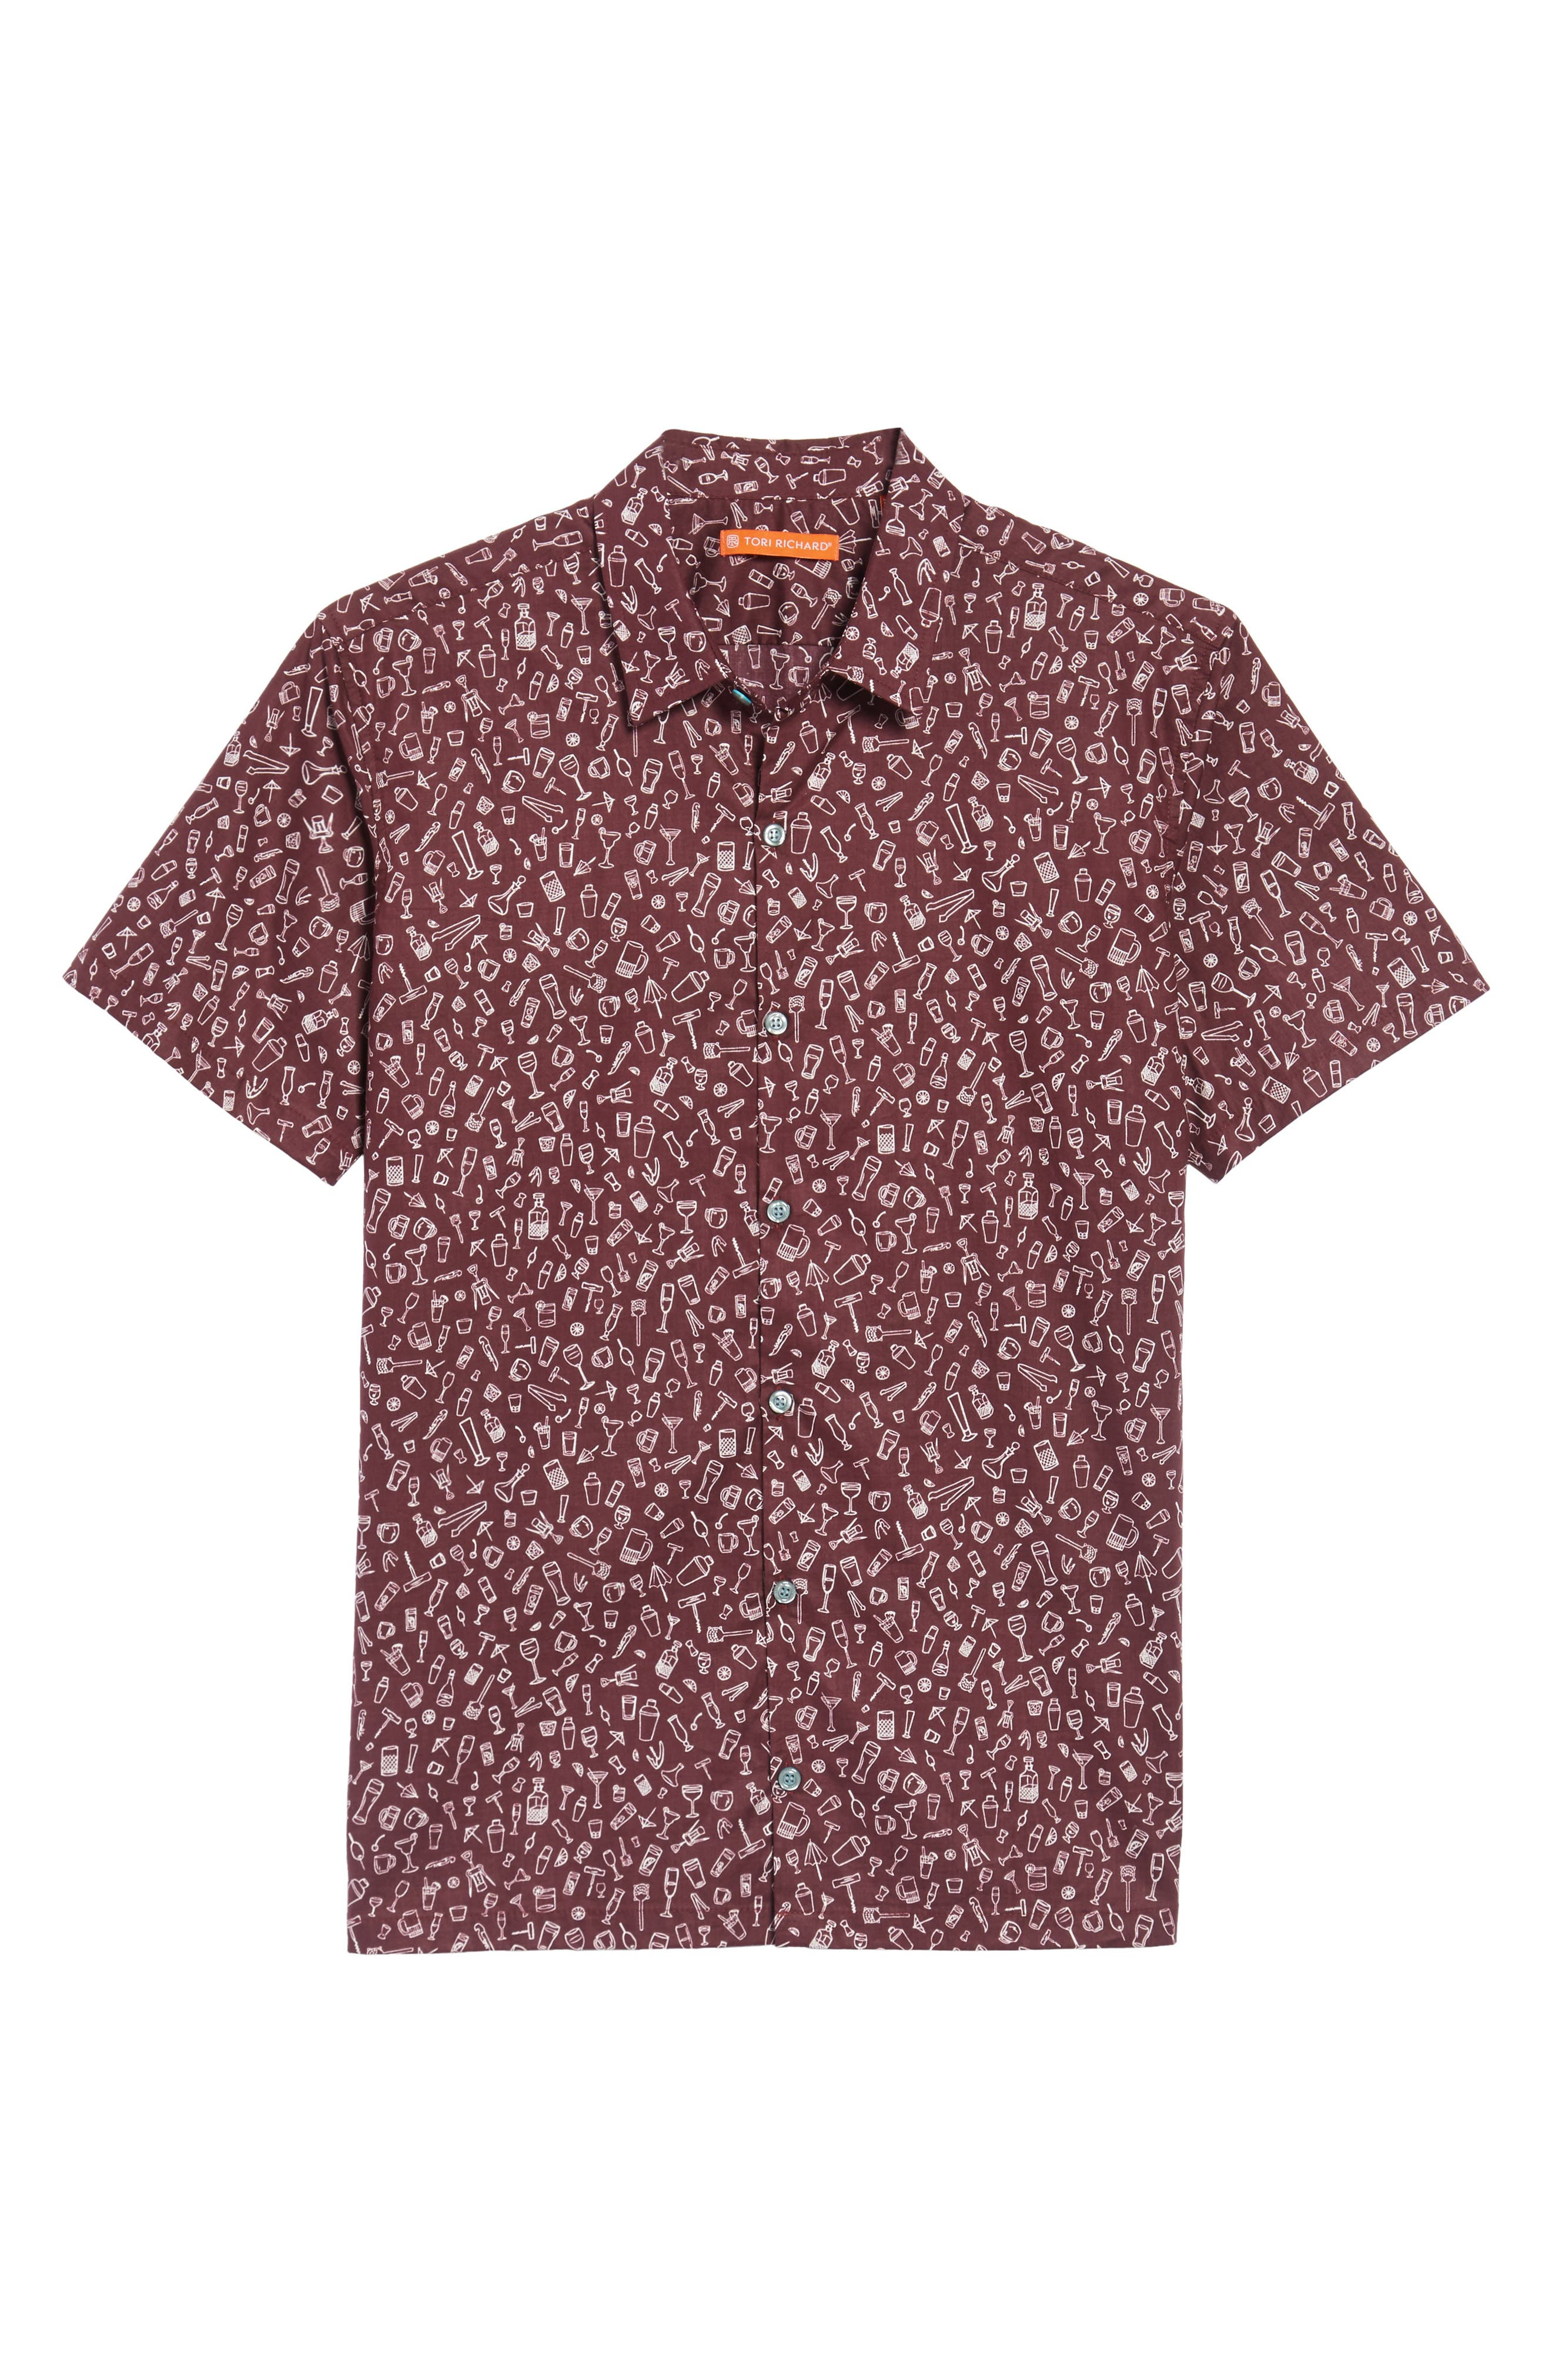 5 PM Slim Fit Camp Shirt,                             Alternate thumbnail 6, color,                             600